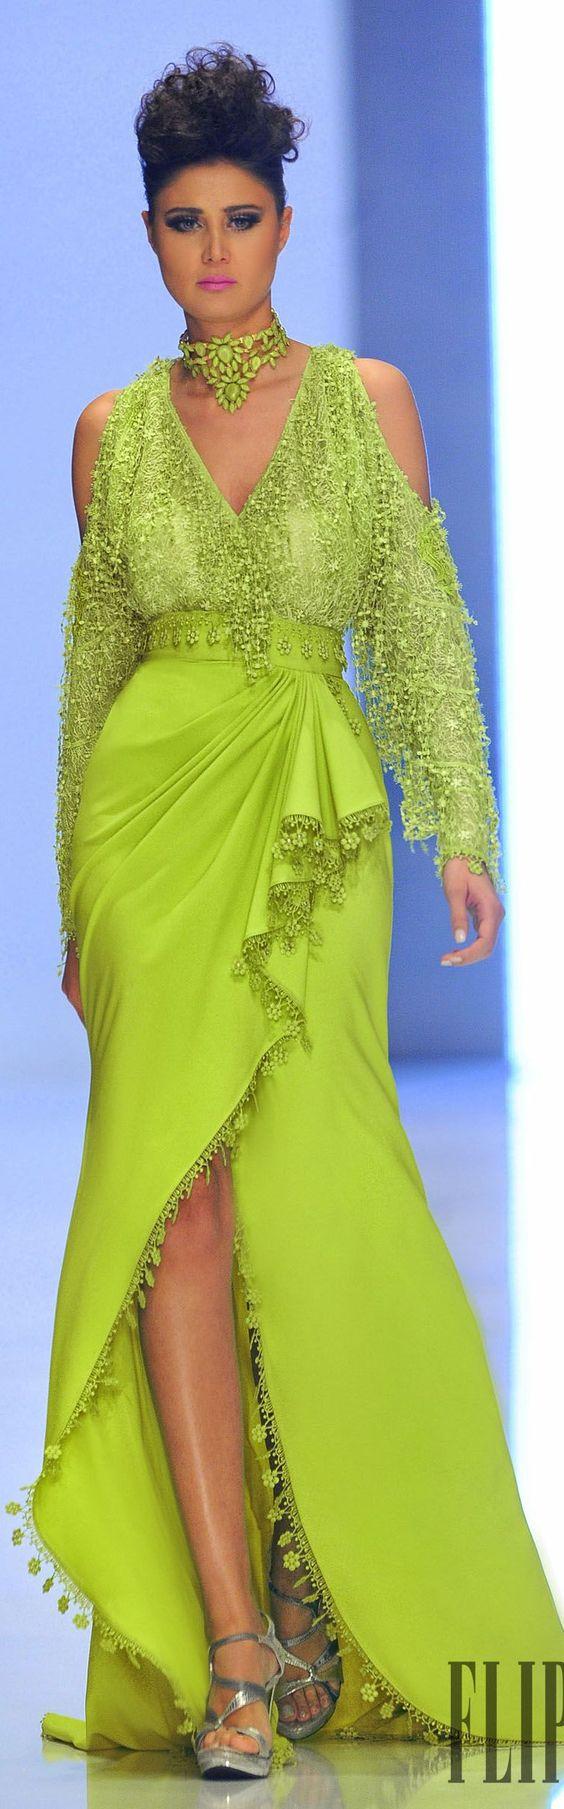 Fouad Sarkis Spring-summer 2014 Couture - #Luxurydotcom